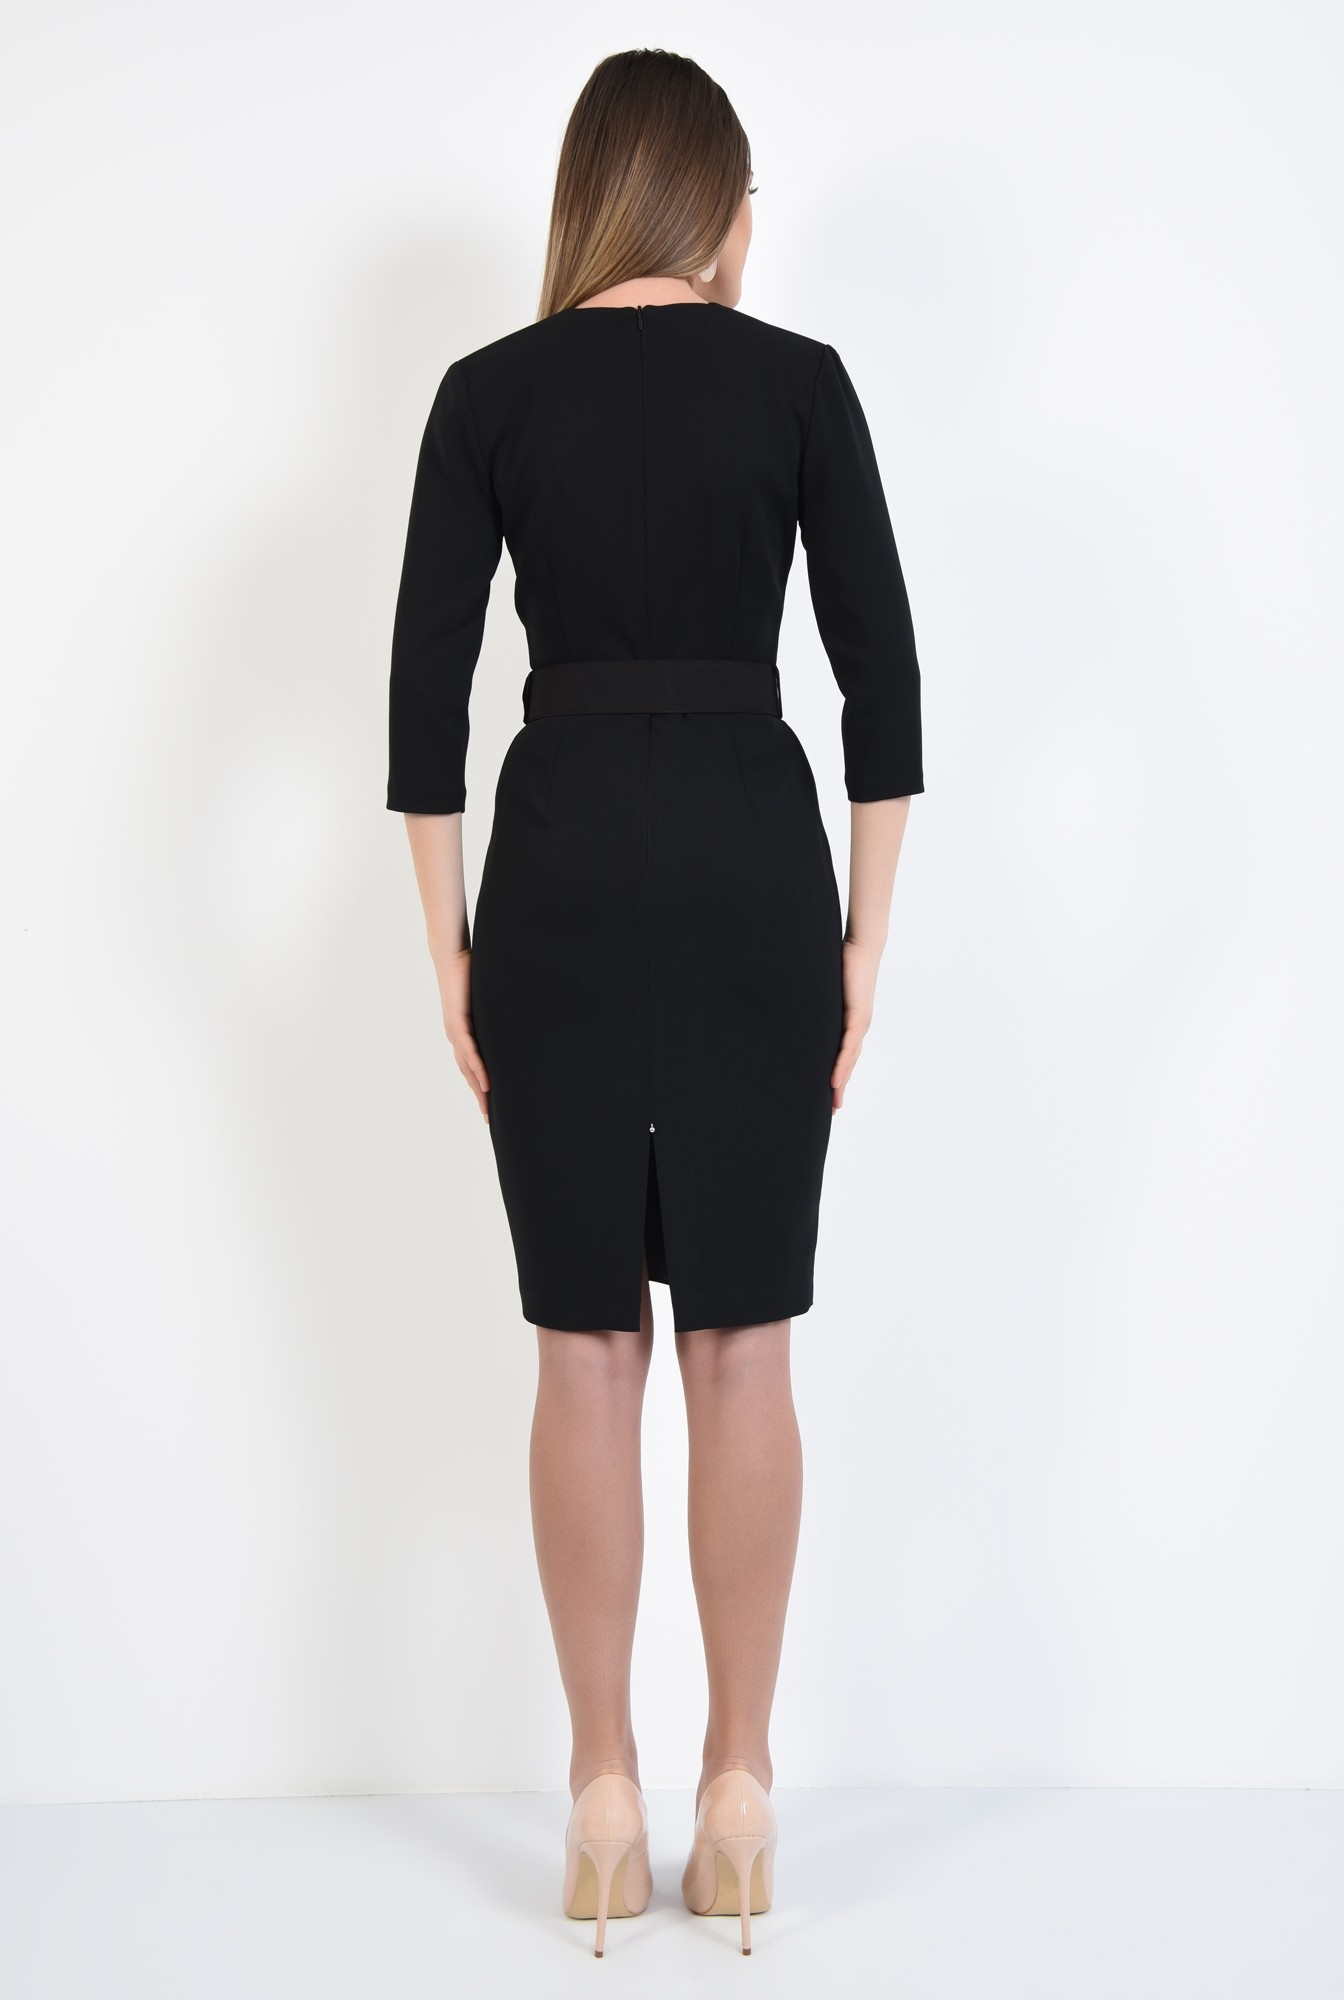 1 - rochie neagra, office, conica, cu centura